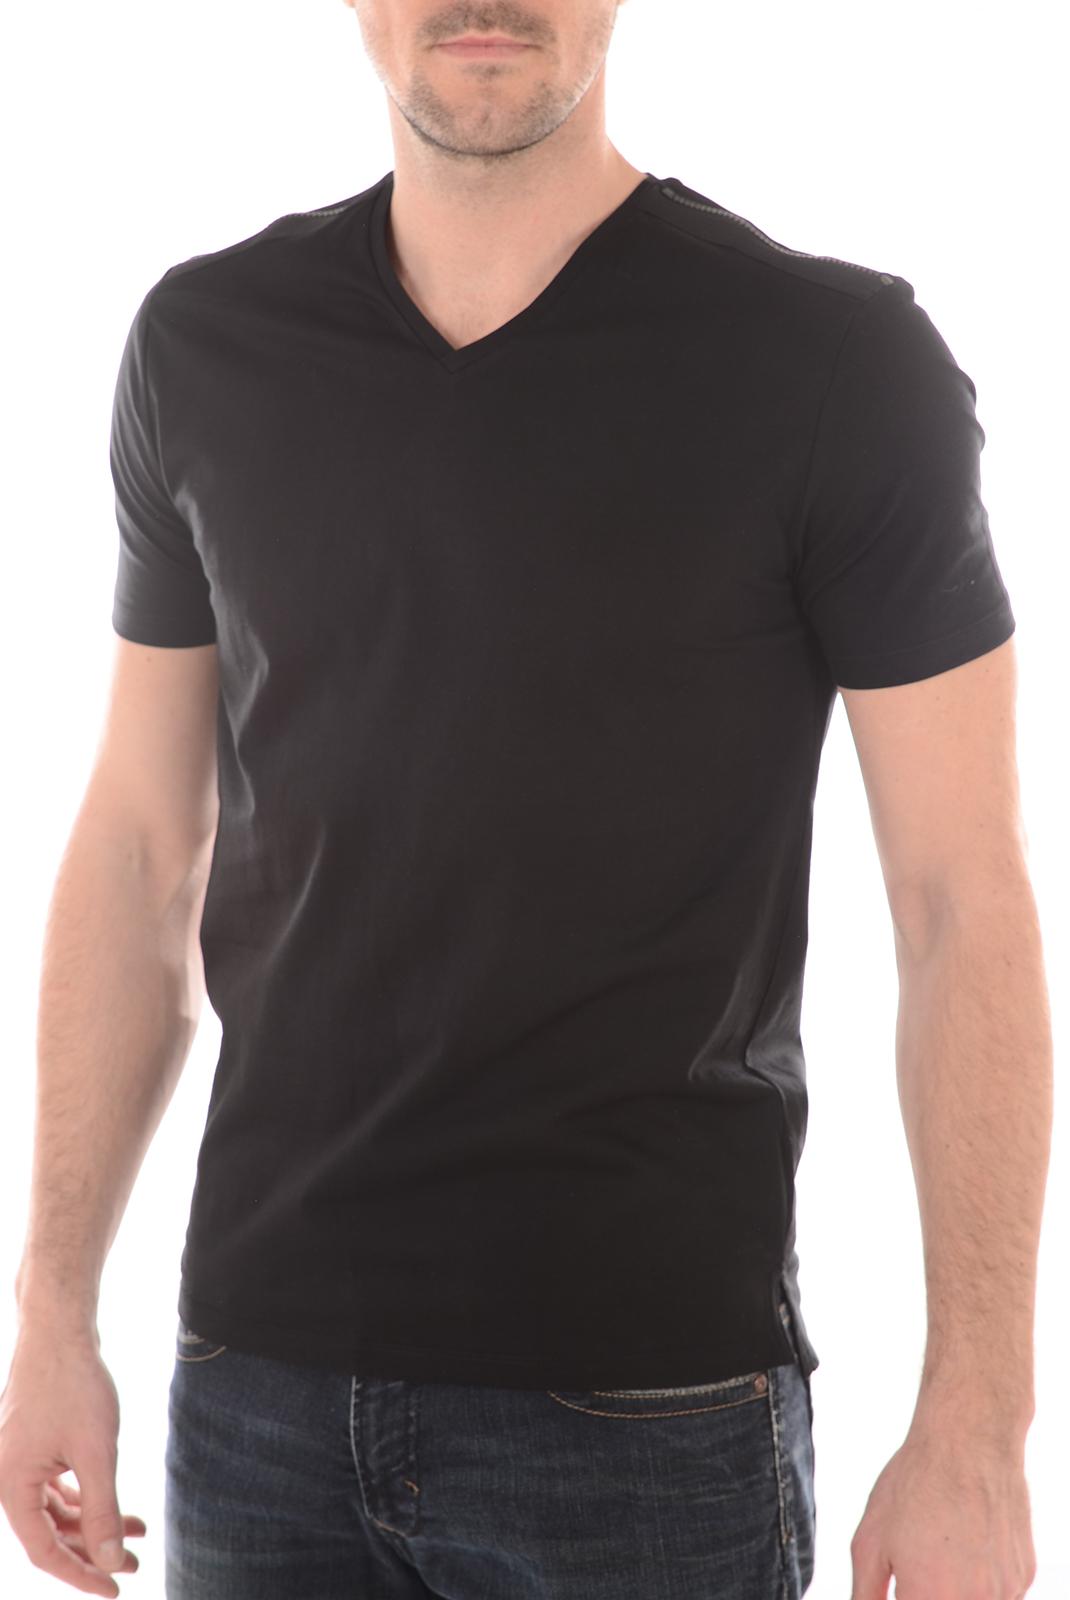 Tee-shirts  Antony morato MMKS00797 9000 NOIR